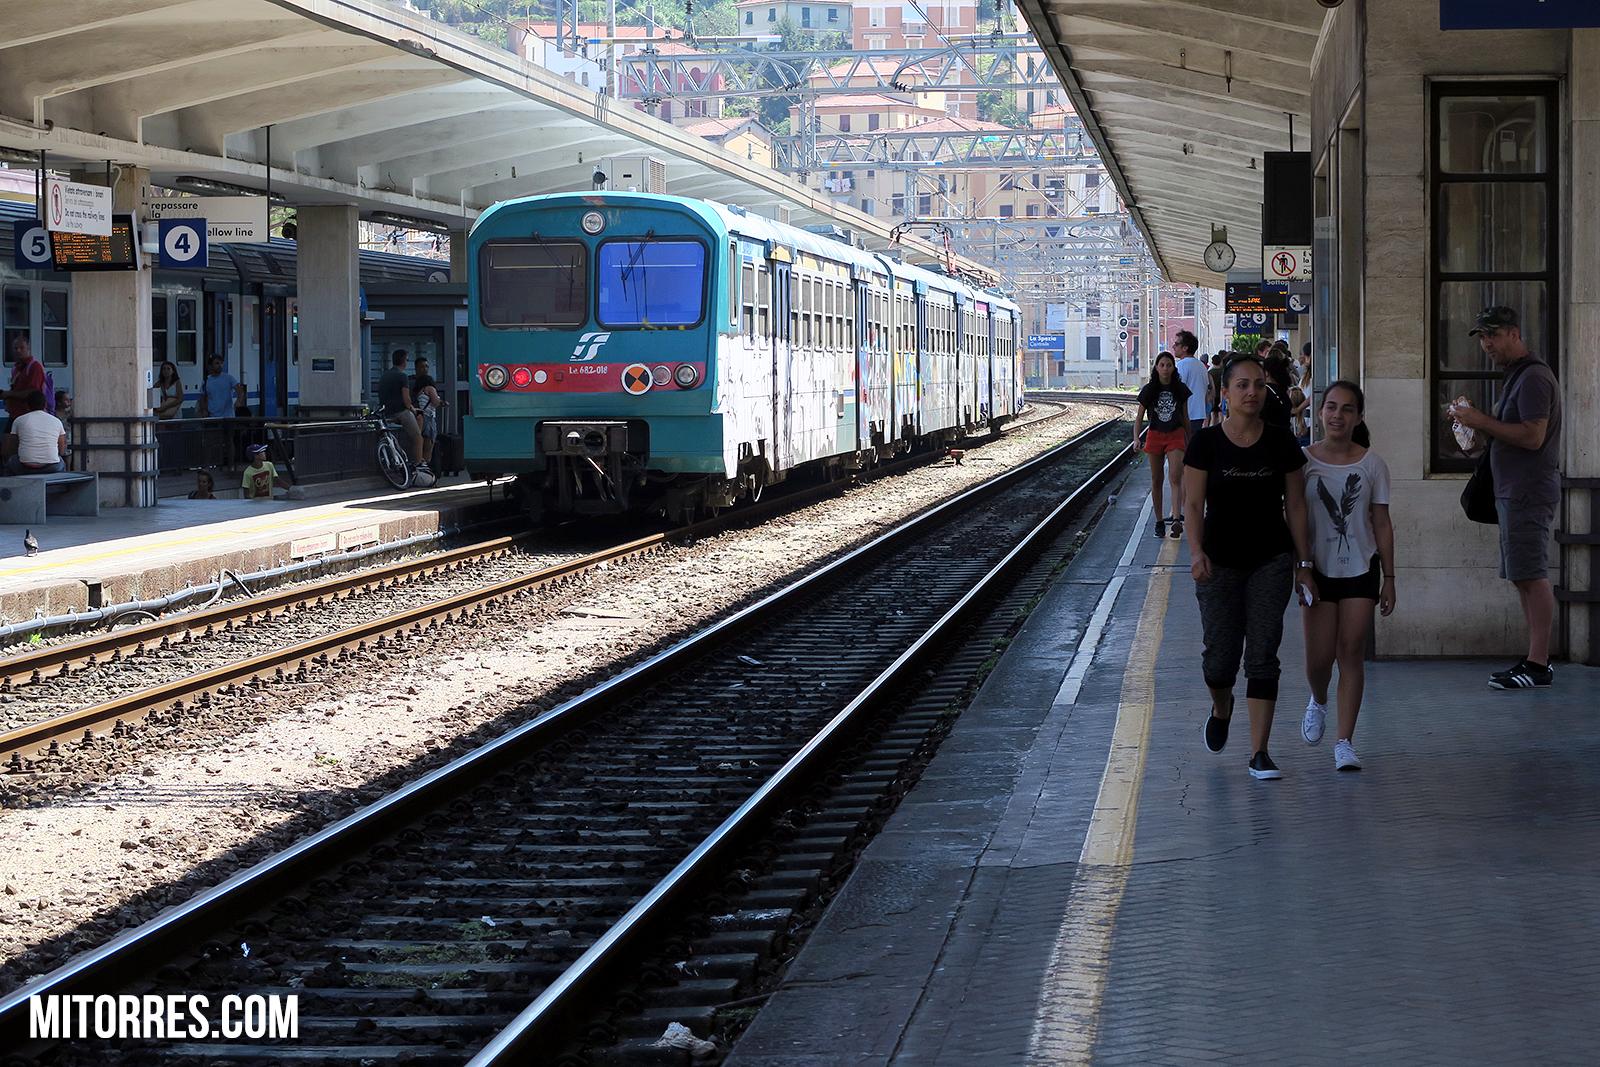 La Spezia train station. Italy Photo: Marlon I. Torres